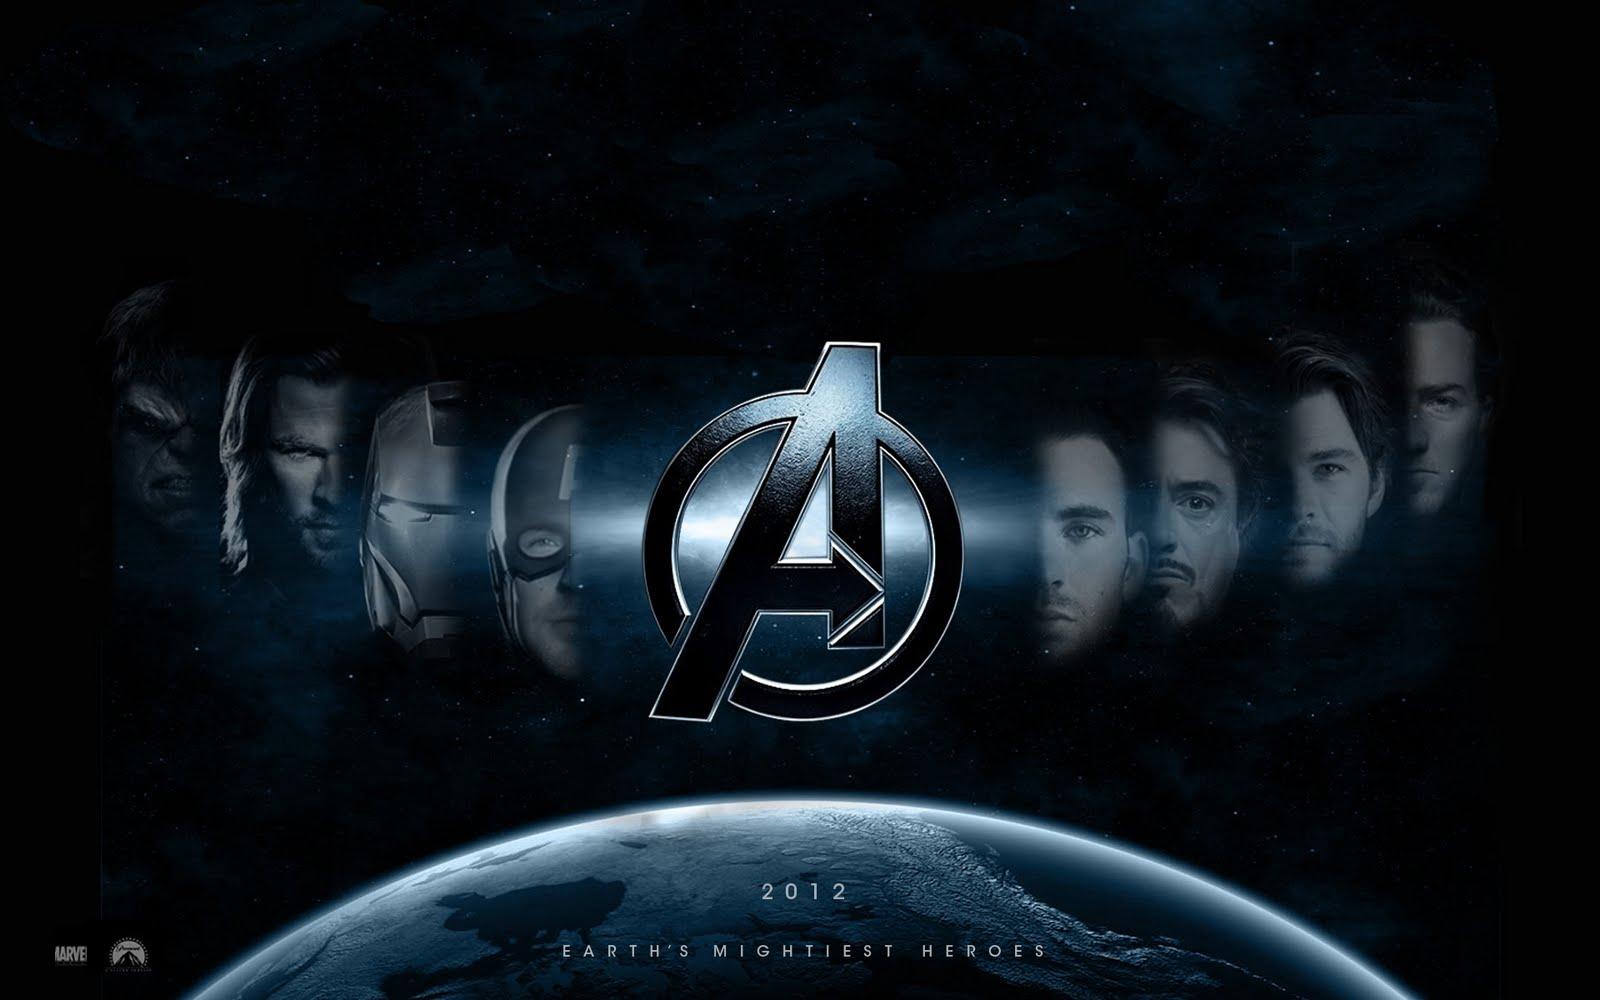 http://3.bp.blogspot.com/-aqqkeOBxjvA/Tgn-L6SMozI/AAAAAAAADno/CNC4S3C2lsU/s1600/The-Avengers-wallpaper.jpg